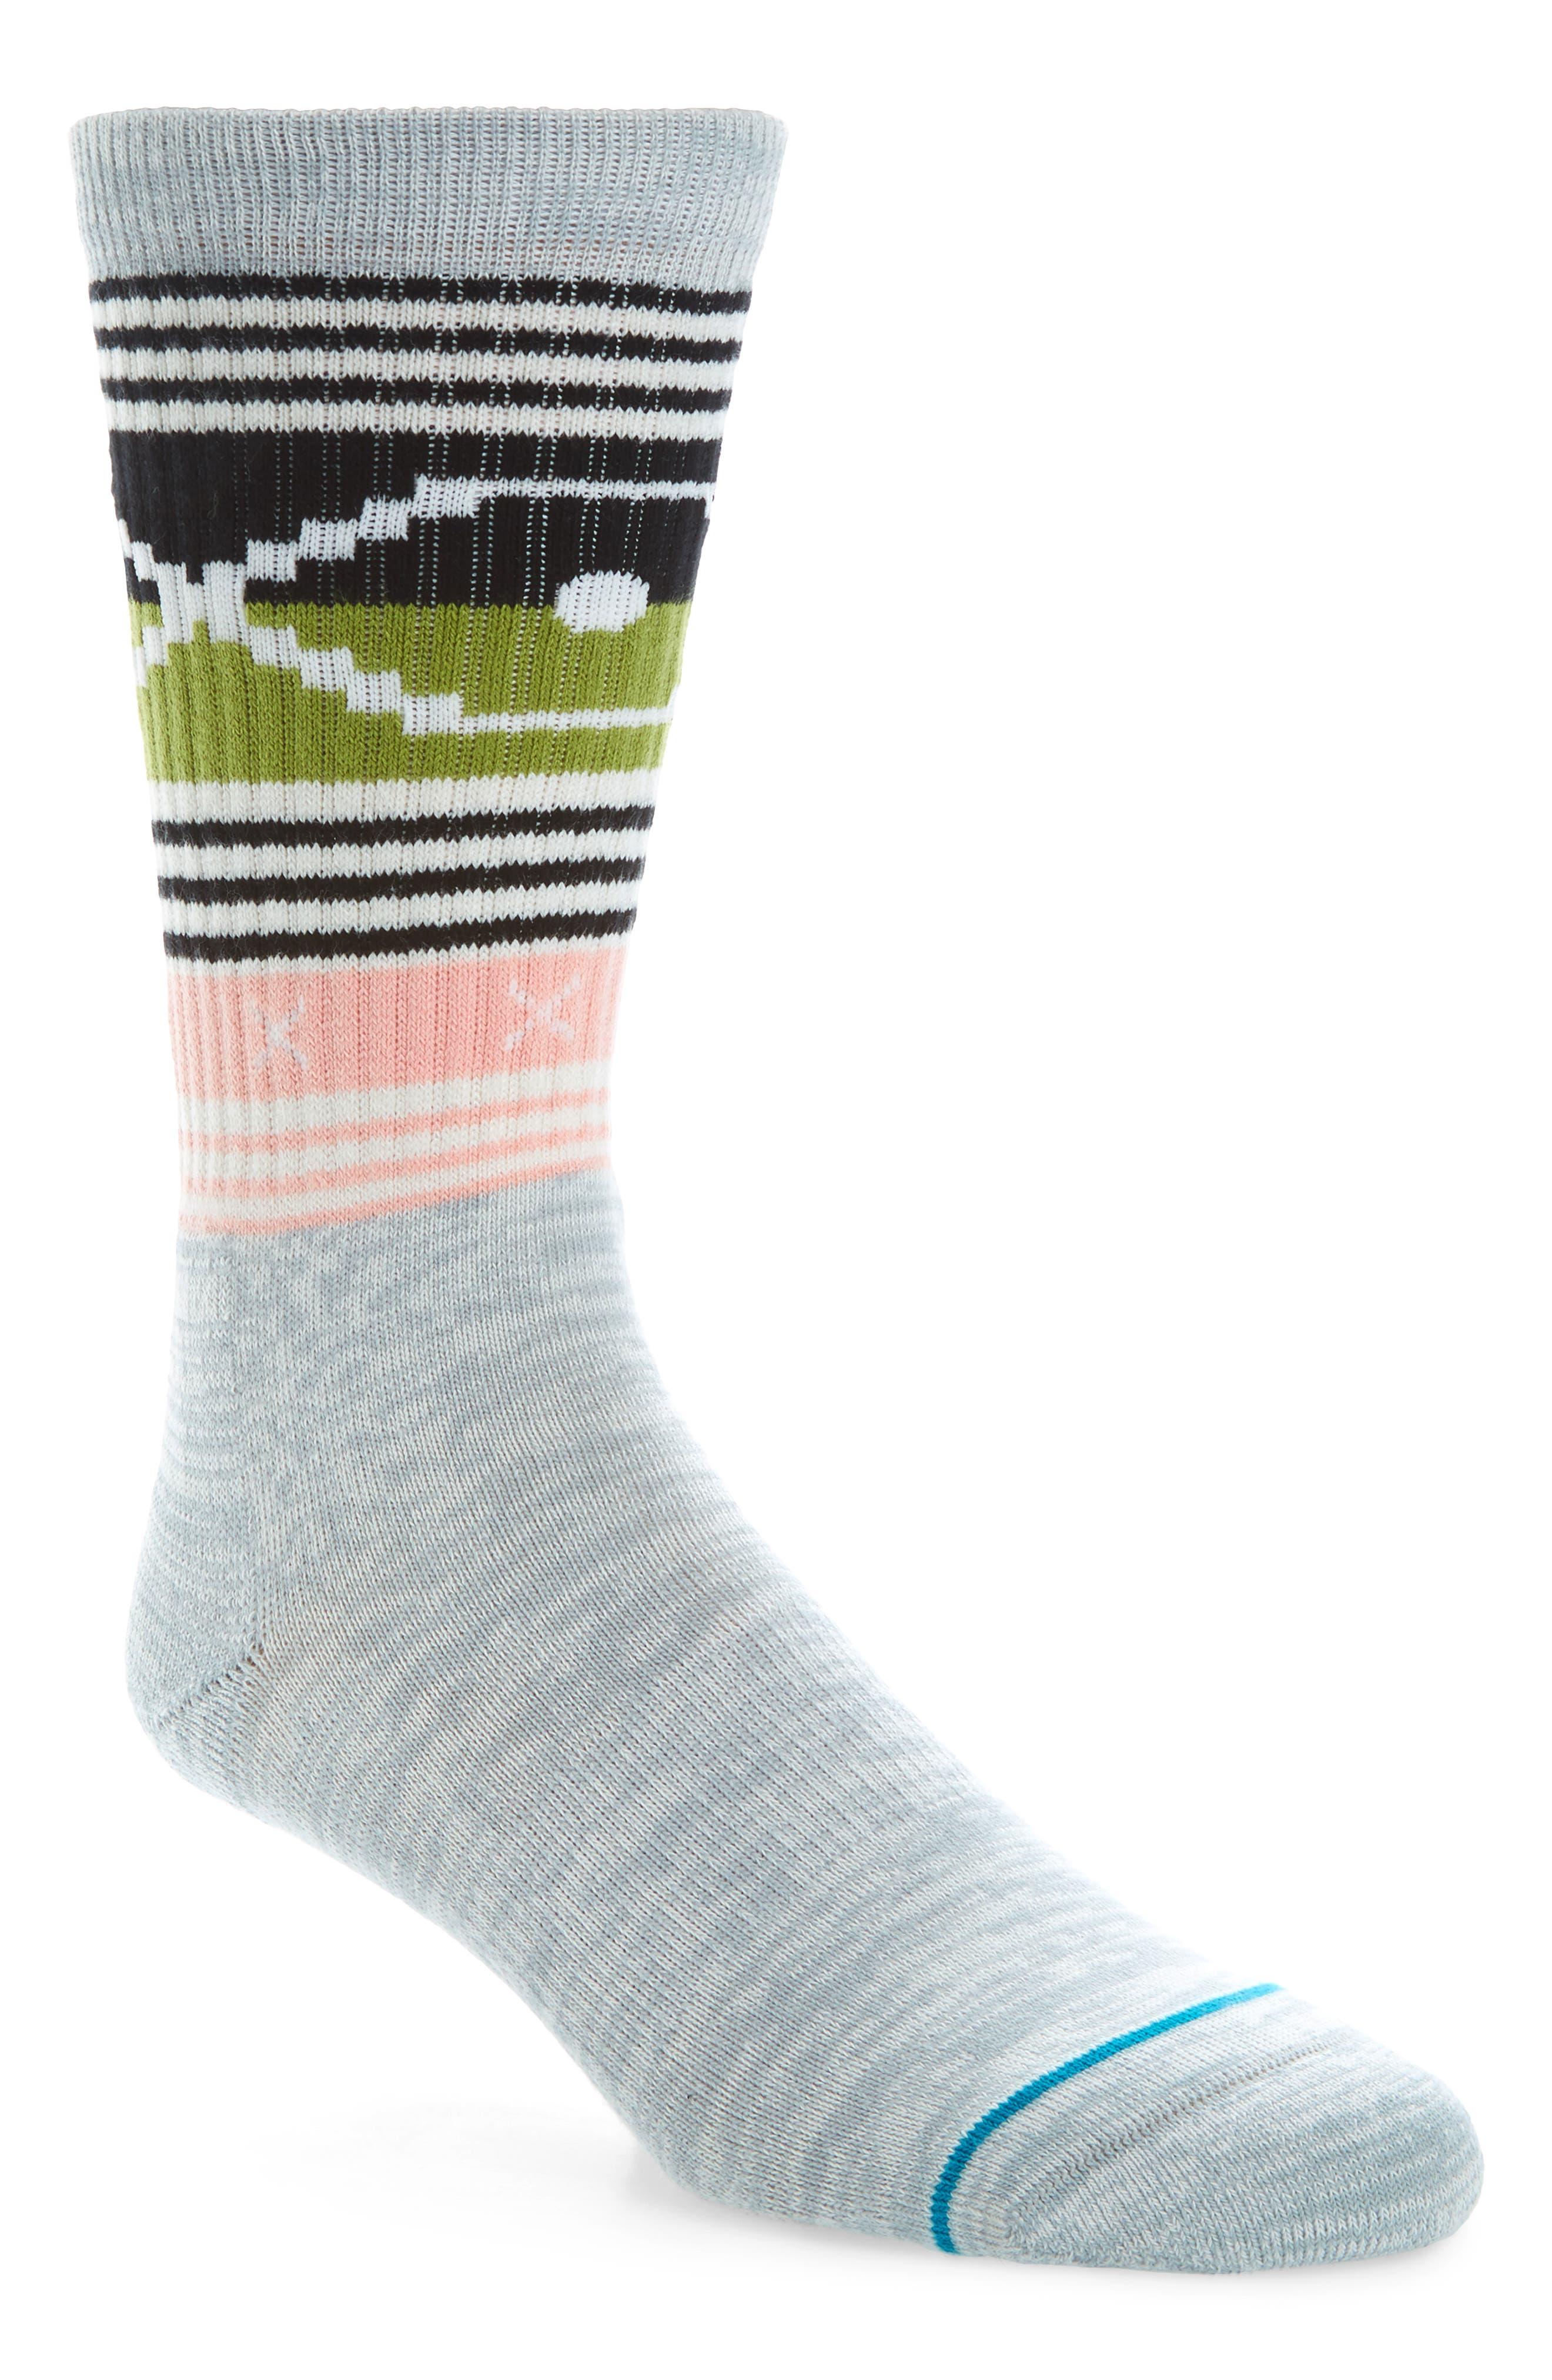 Harries Crew Socks,                             Main thumbnail 1, color,                             020